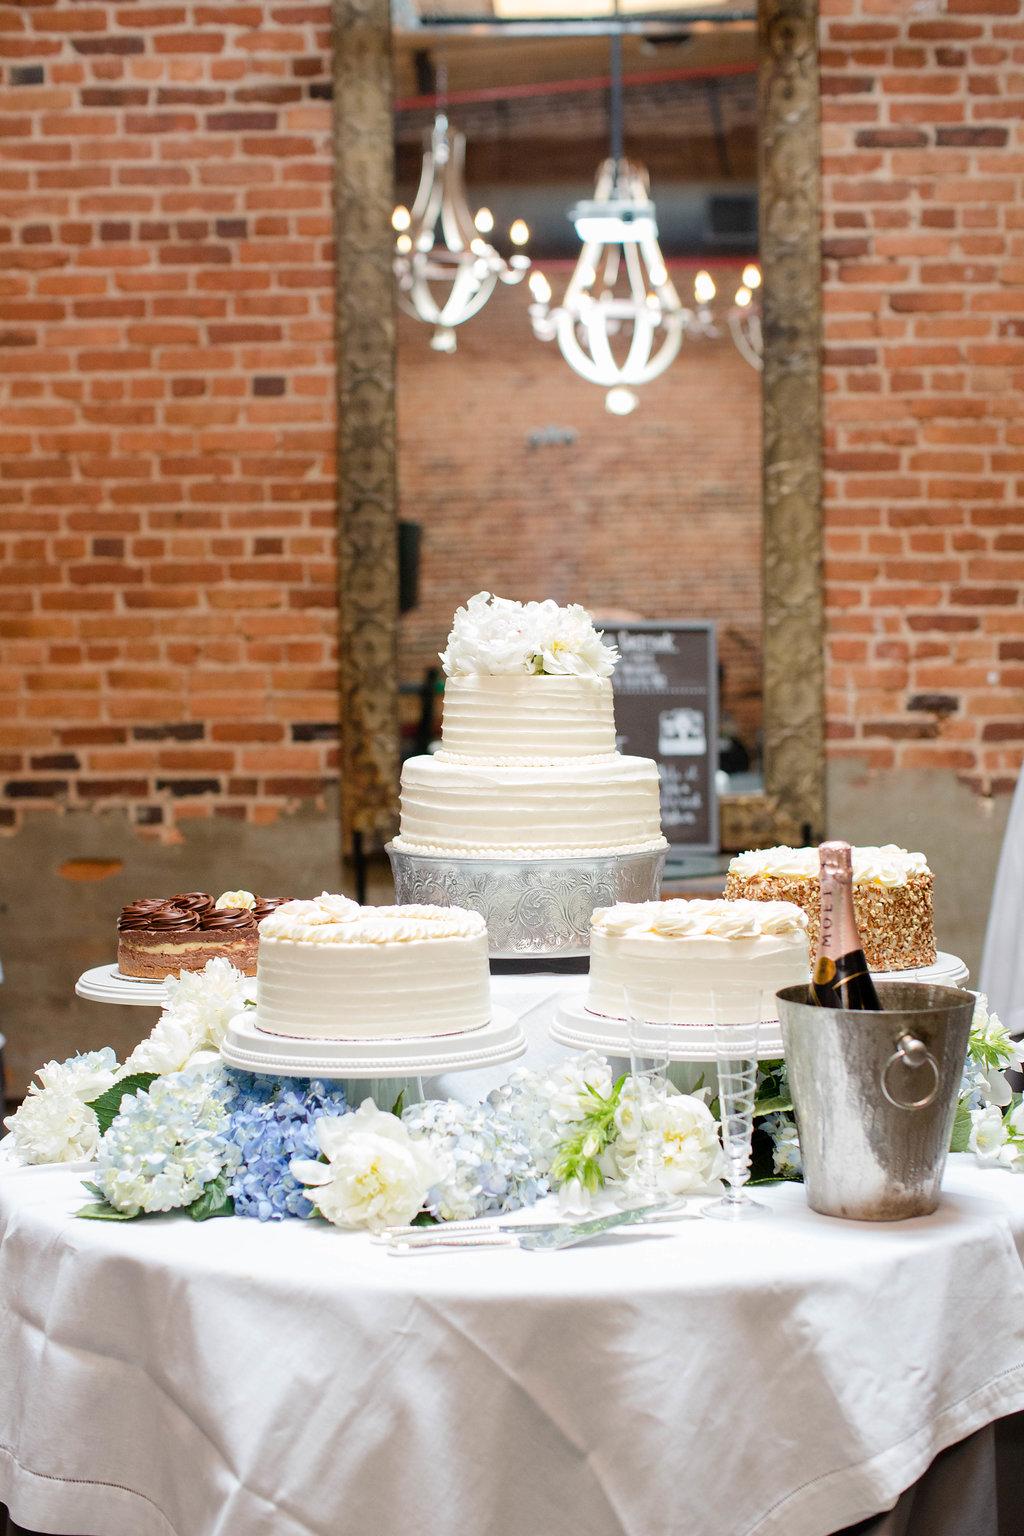 Summer's Temptations wedding cakes